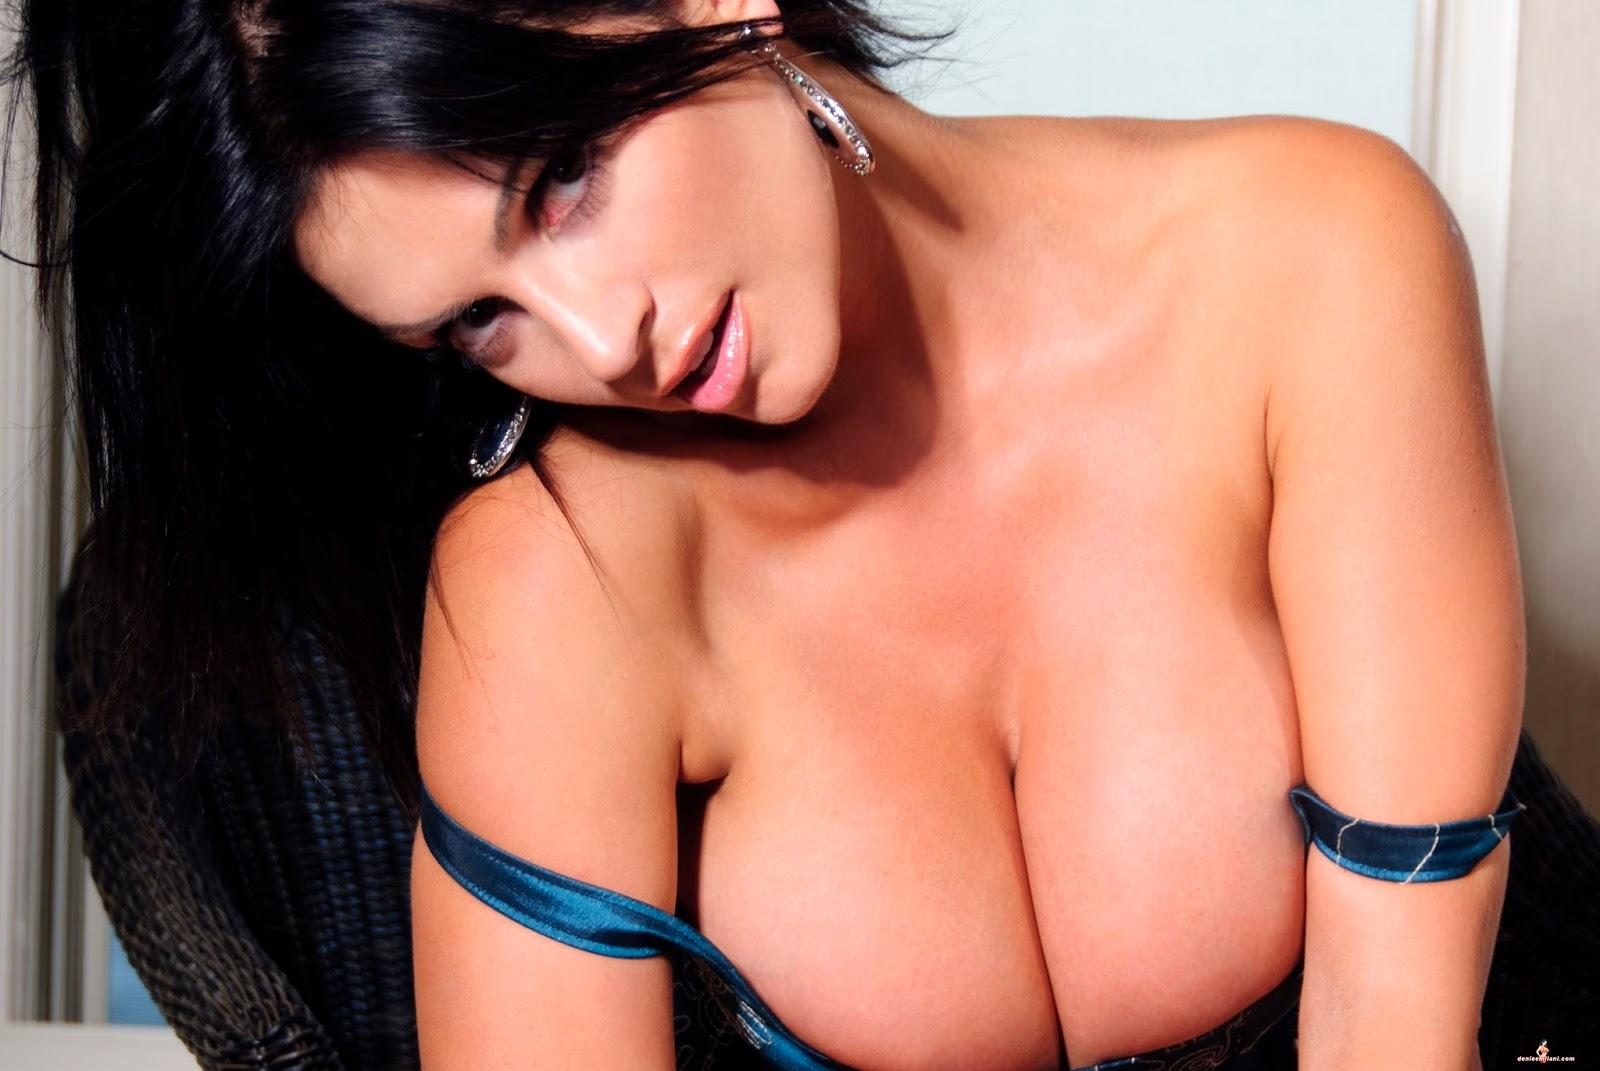 Фото порно денис милани, Denise Milani - все порно и секс фото модели 16 фотография